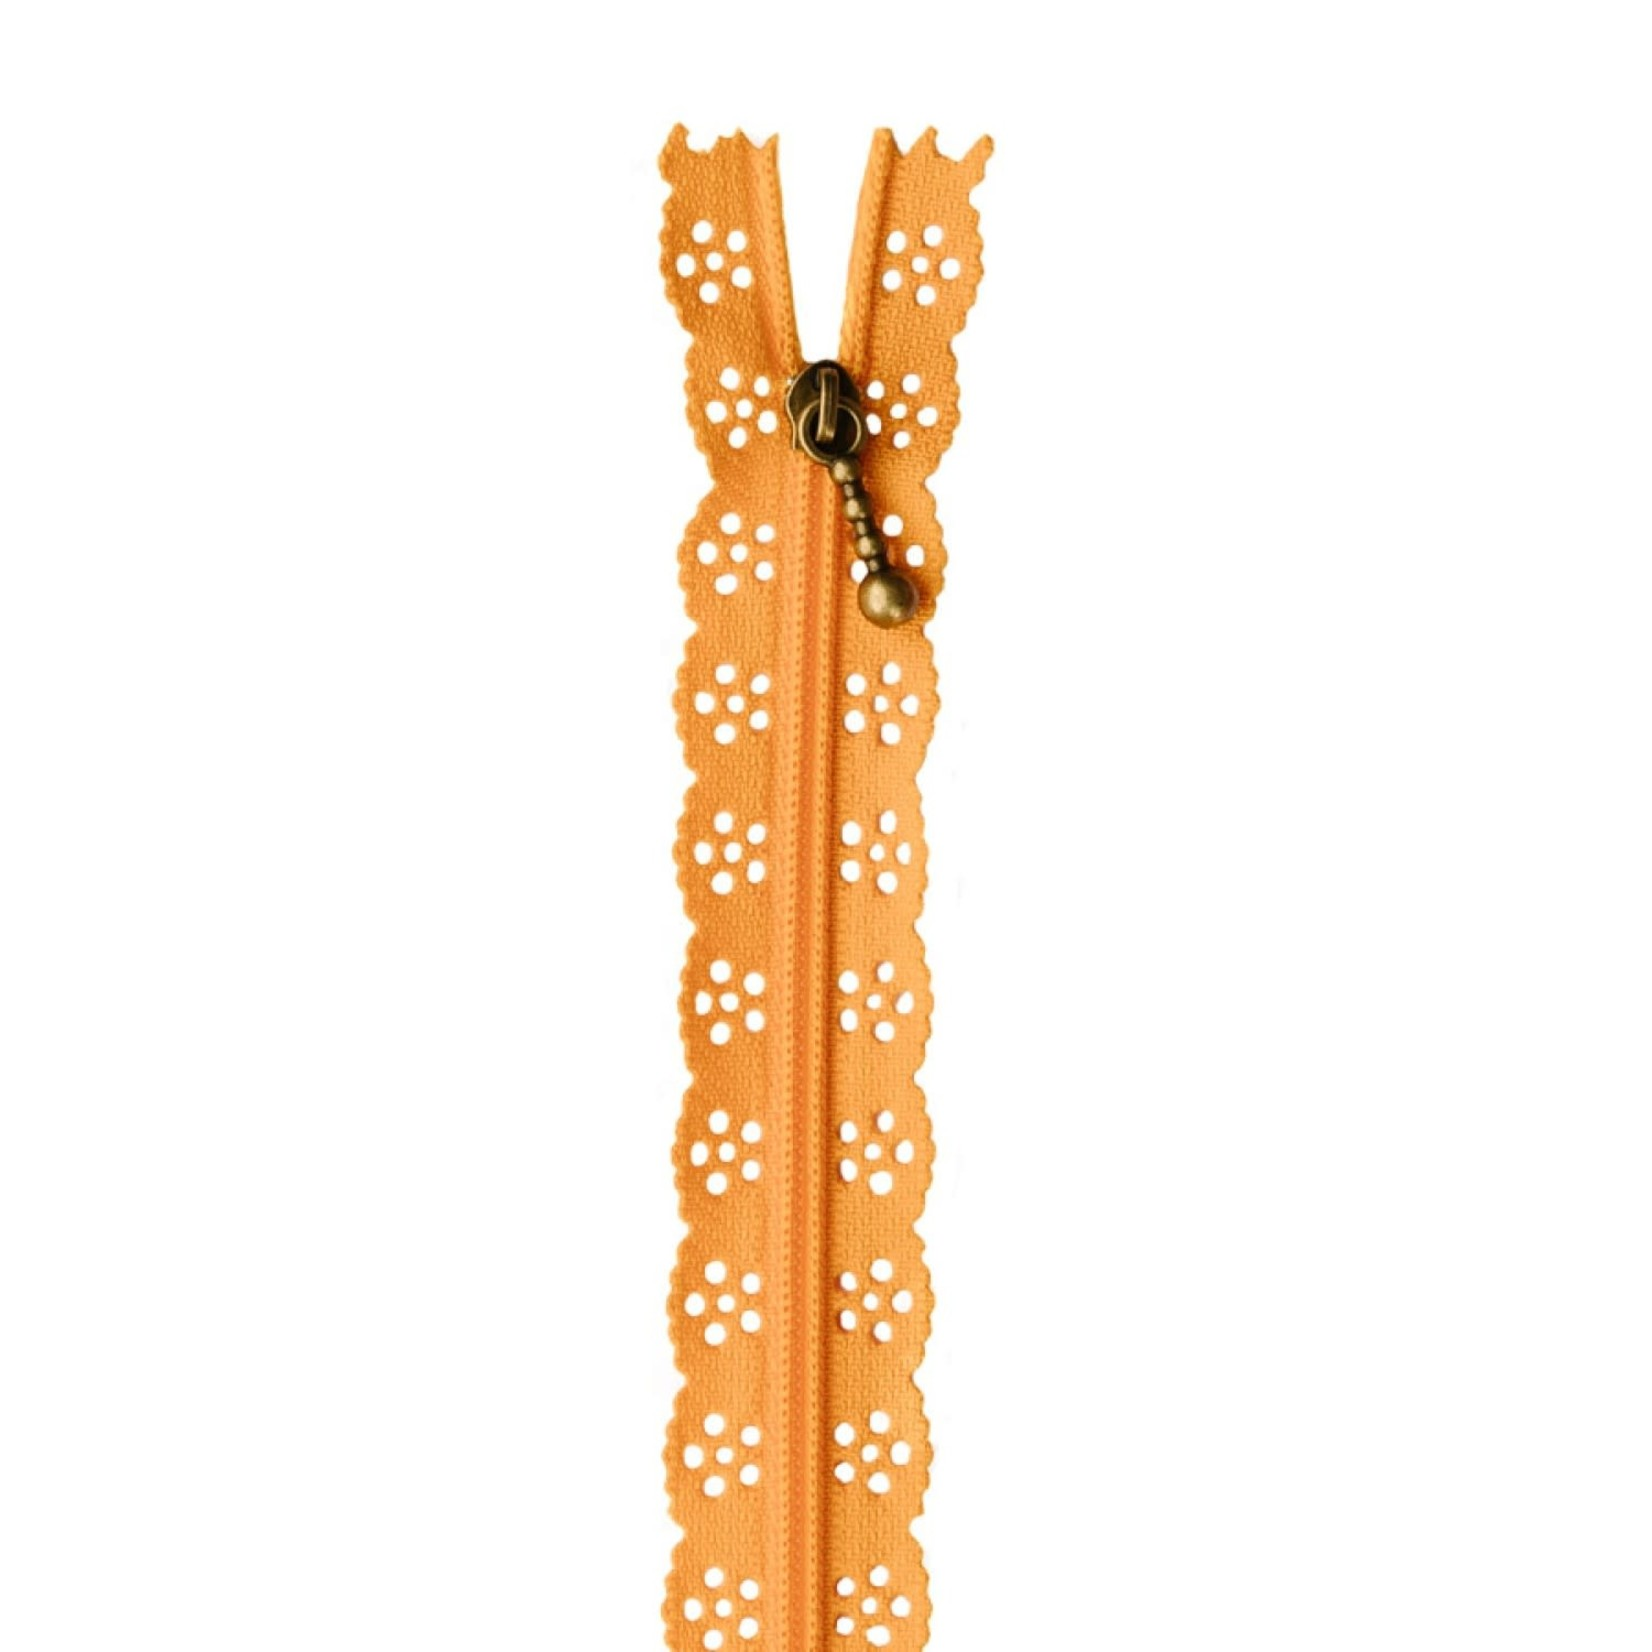 "Kimberbell Designs Lace Zipper 14""- Apricot"